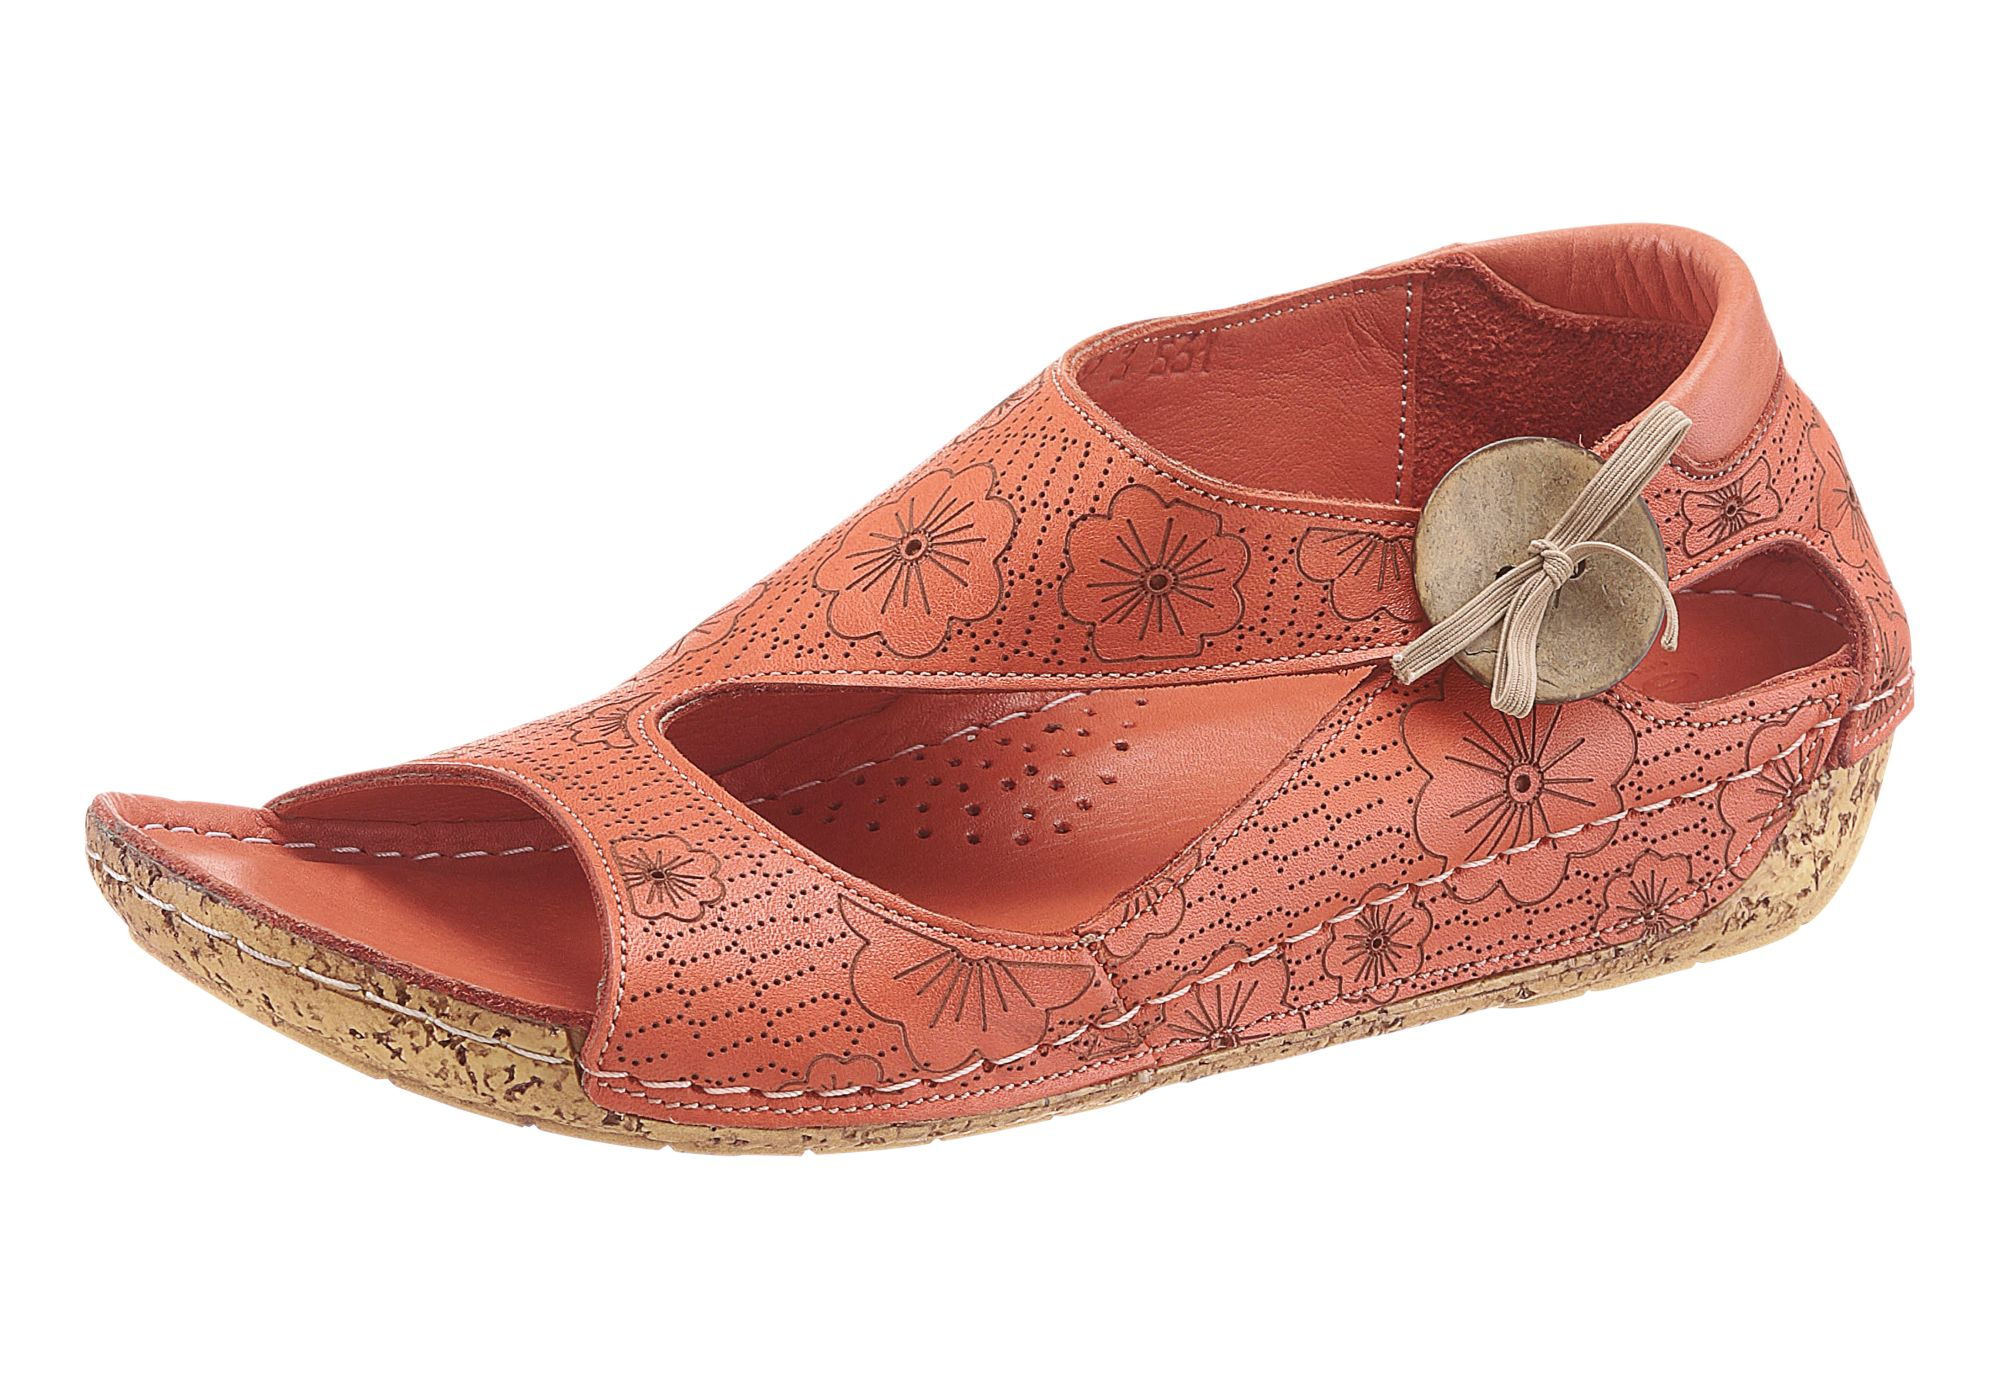 GEMINI Gemini Sandalette mit Blumen-Muster